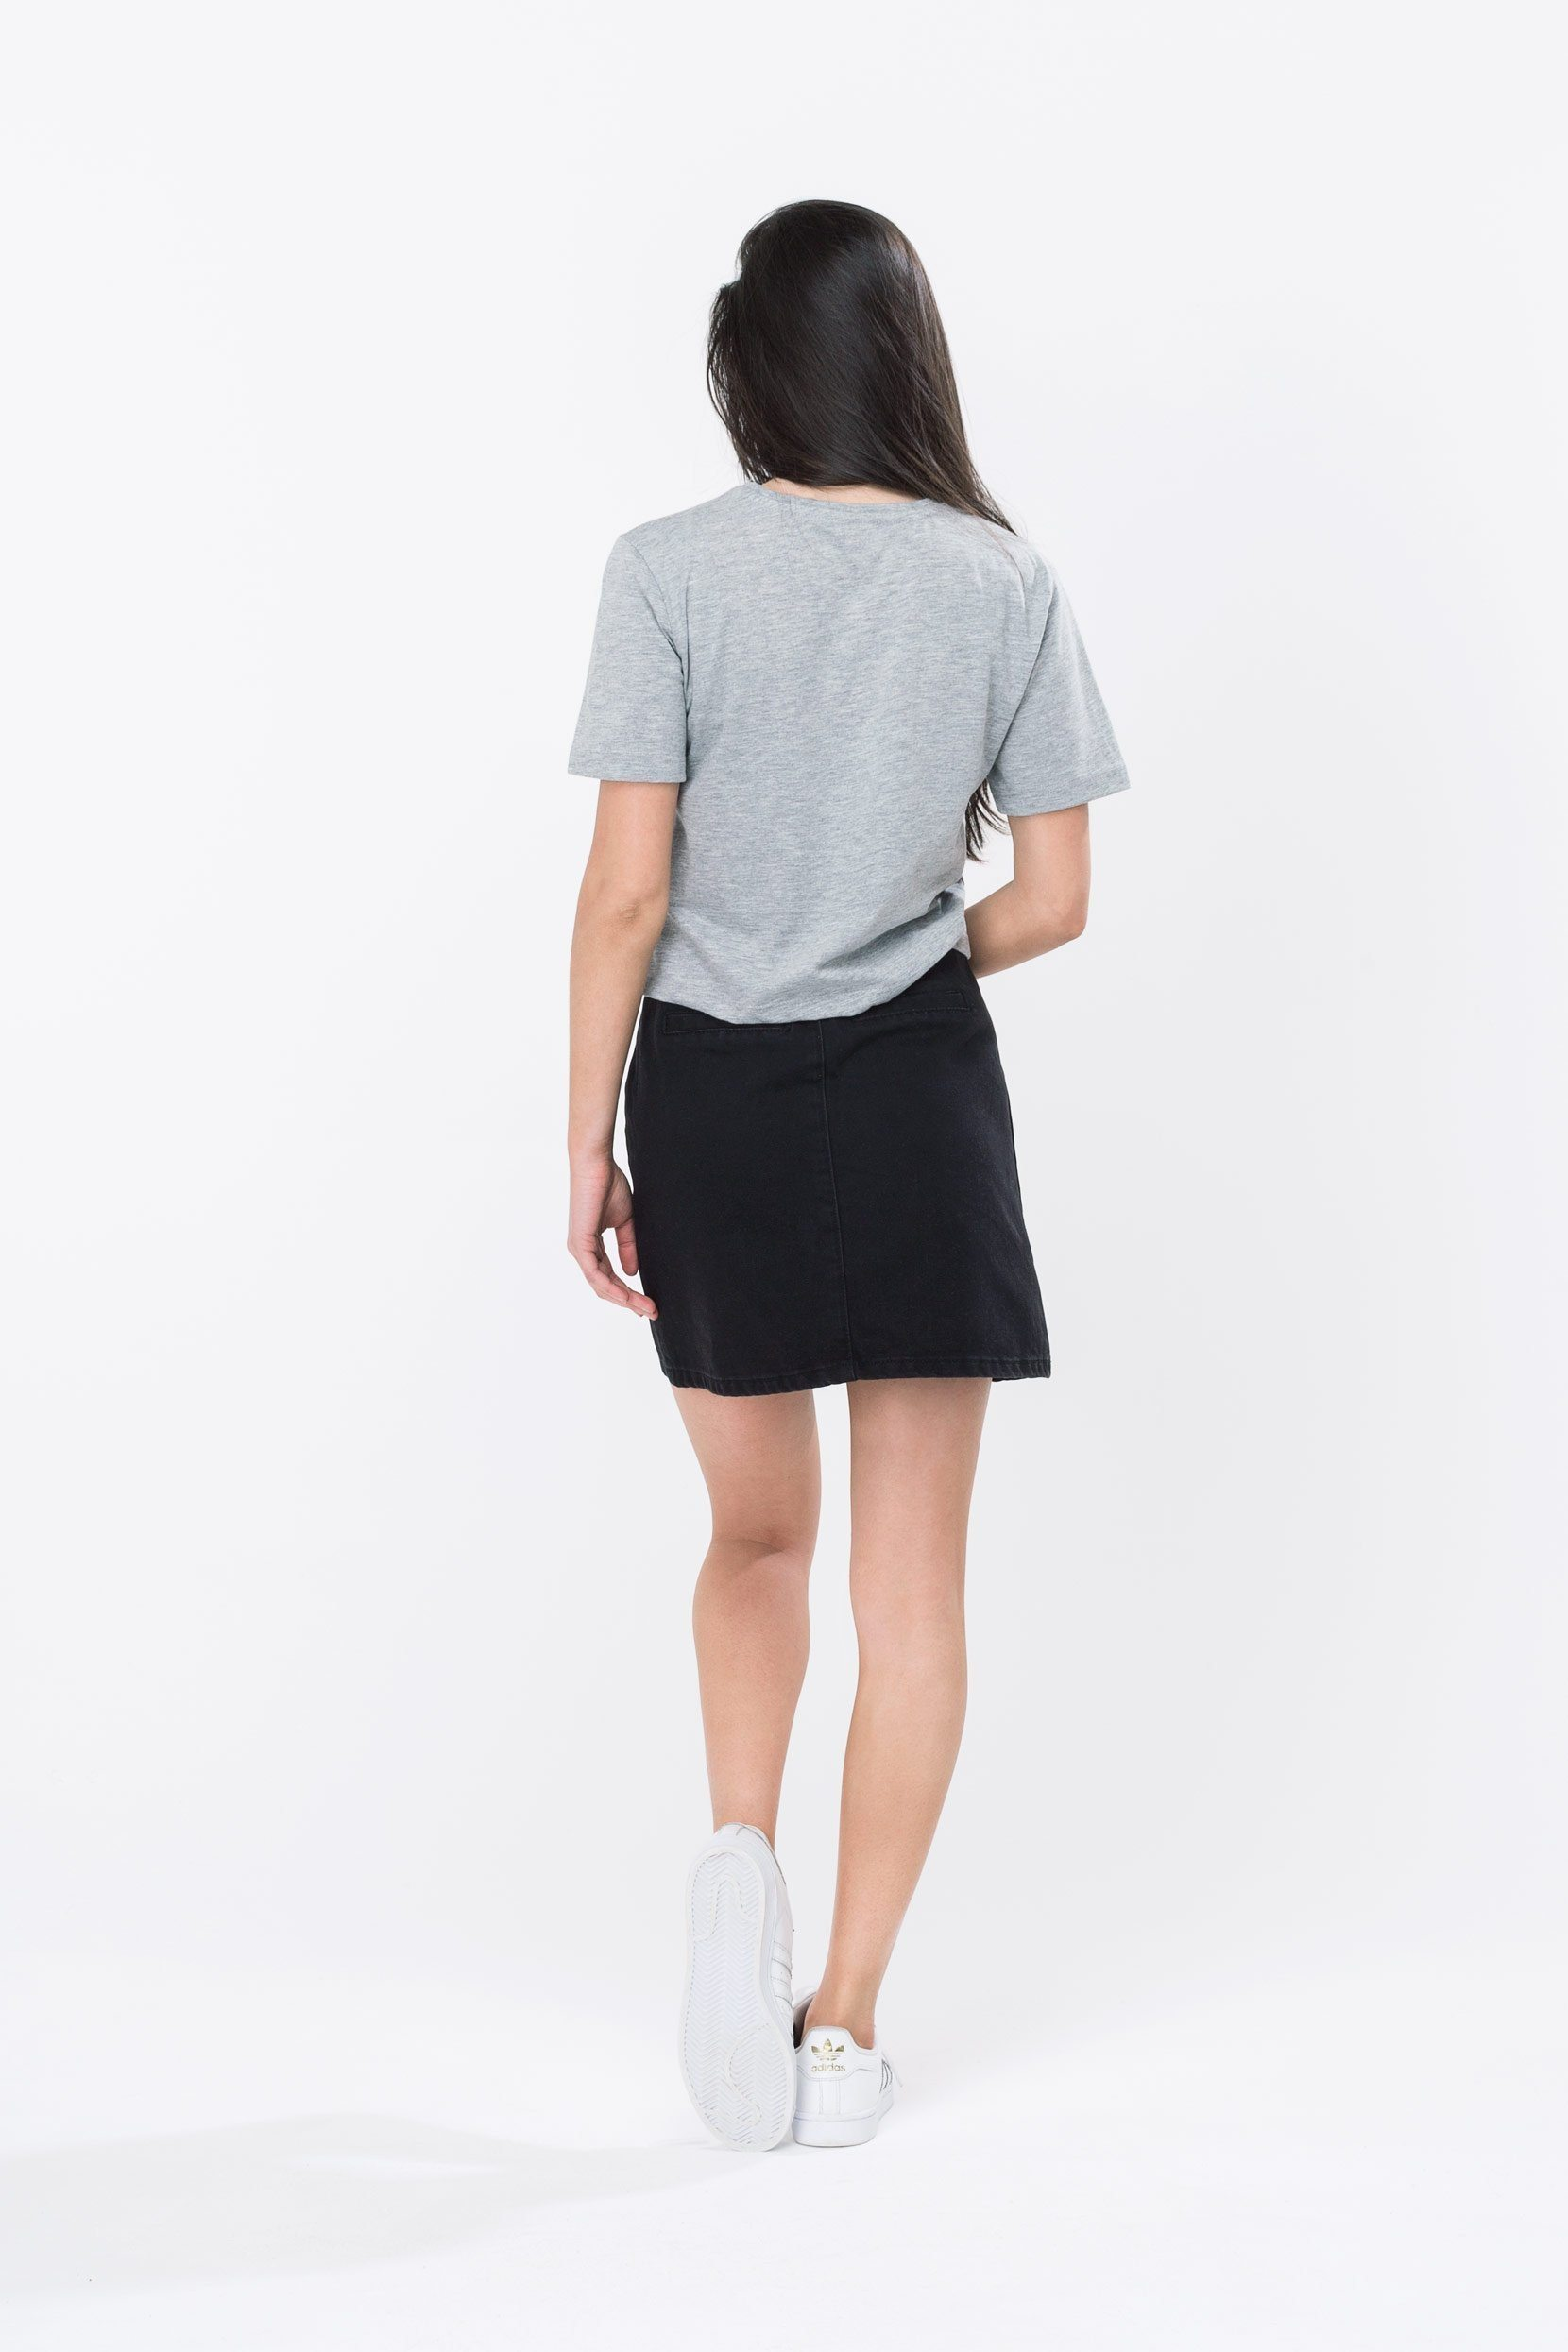 HYPE Grey/Black Hype Script Women's Crop T-Shirt